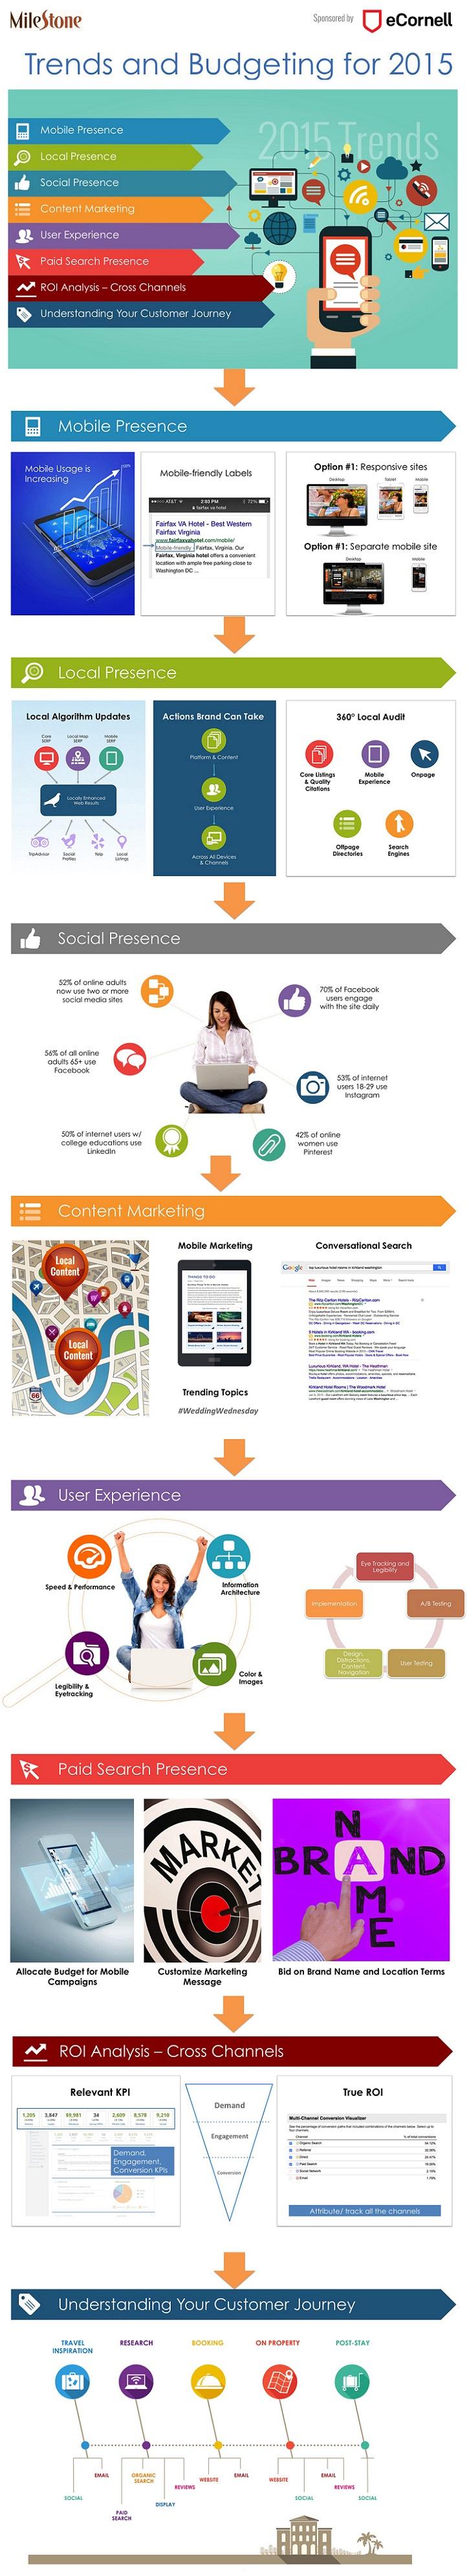 2015 Top Digital Marketing Strategies for Hotels